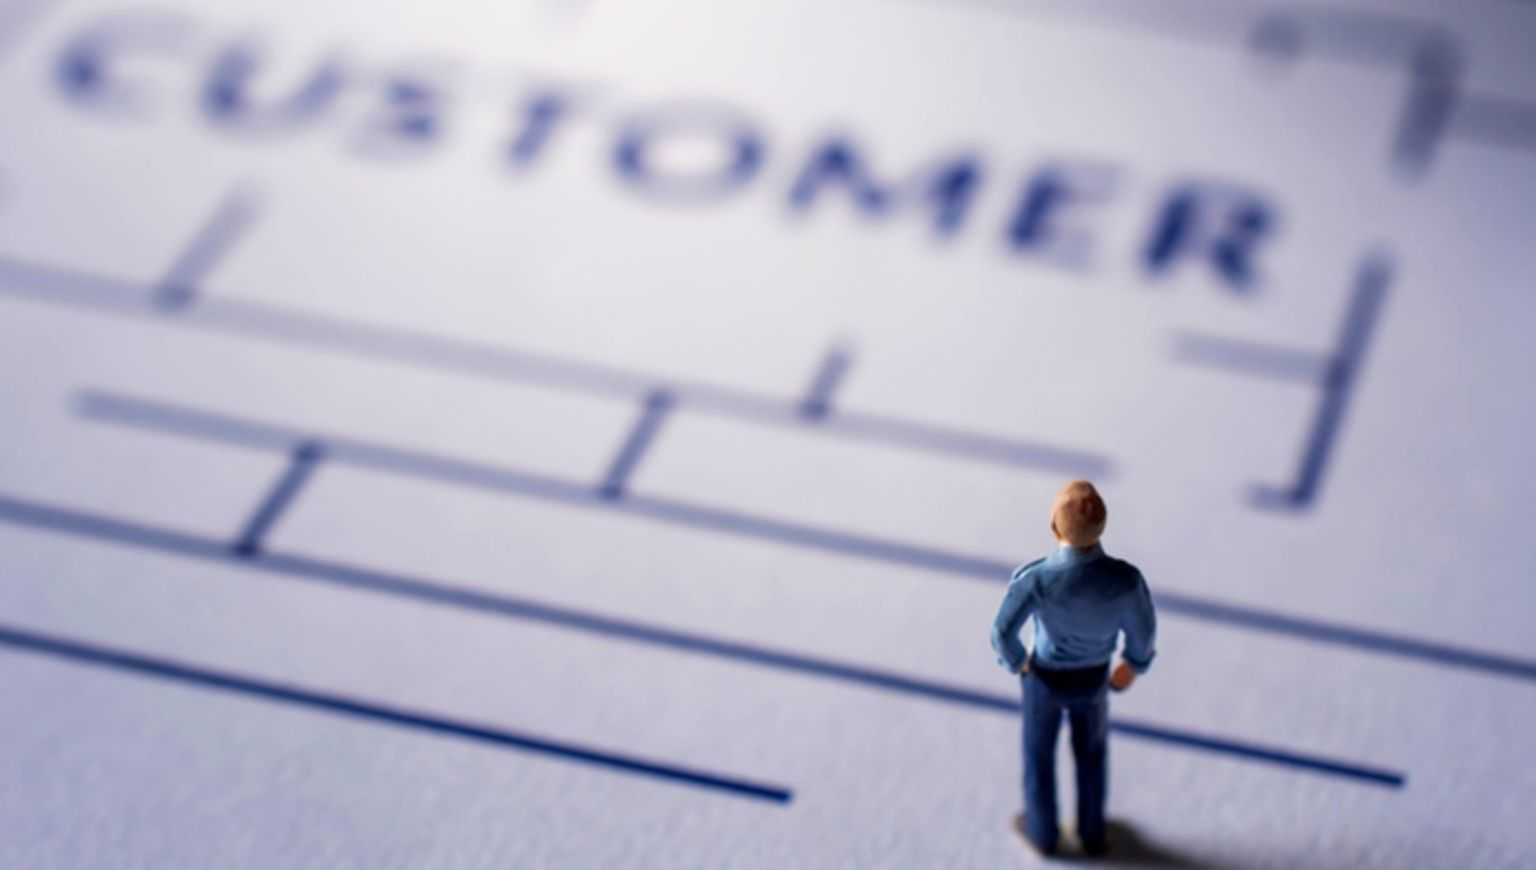 A miniture figurine man on a paper maze.